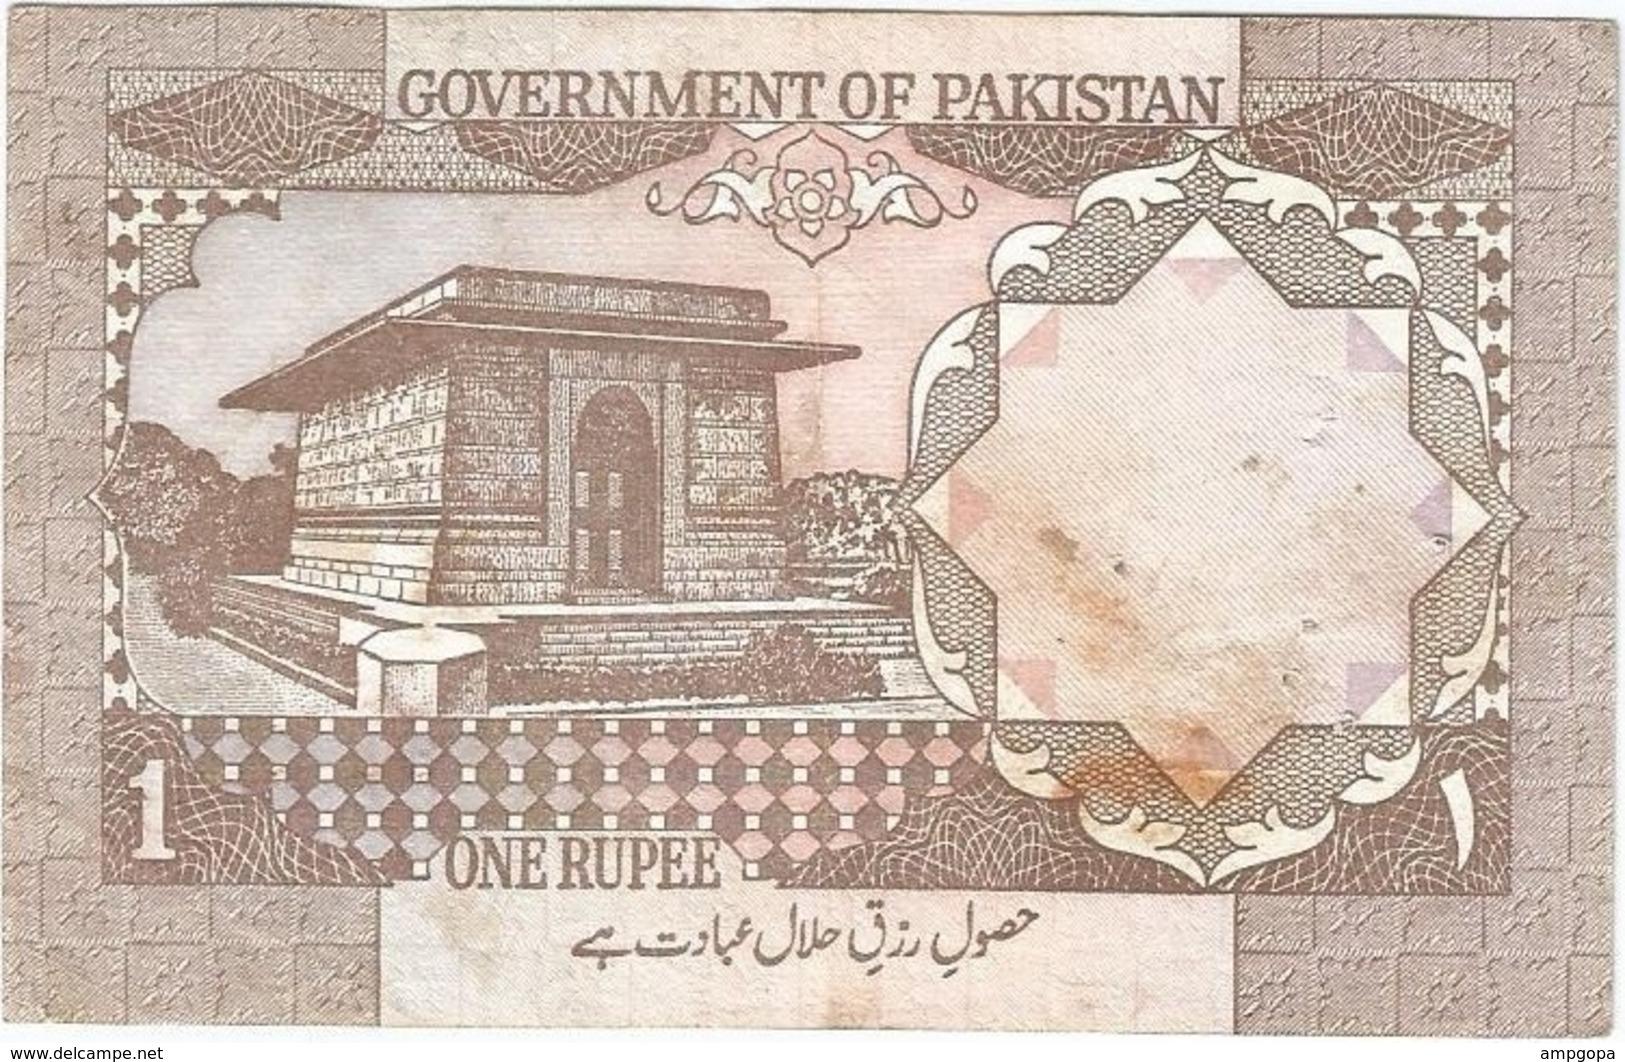 Pakistán 1 Rupee 1983 Pk 27 M Firma Mian Tayeb Hasan, Serie Abajo A Derecha Ref 1916 - Pakistan